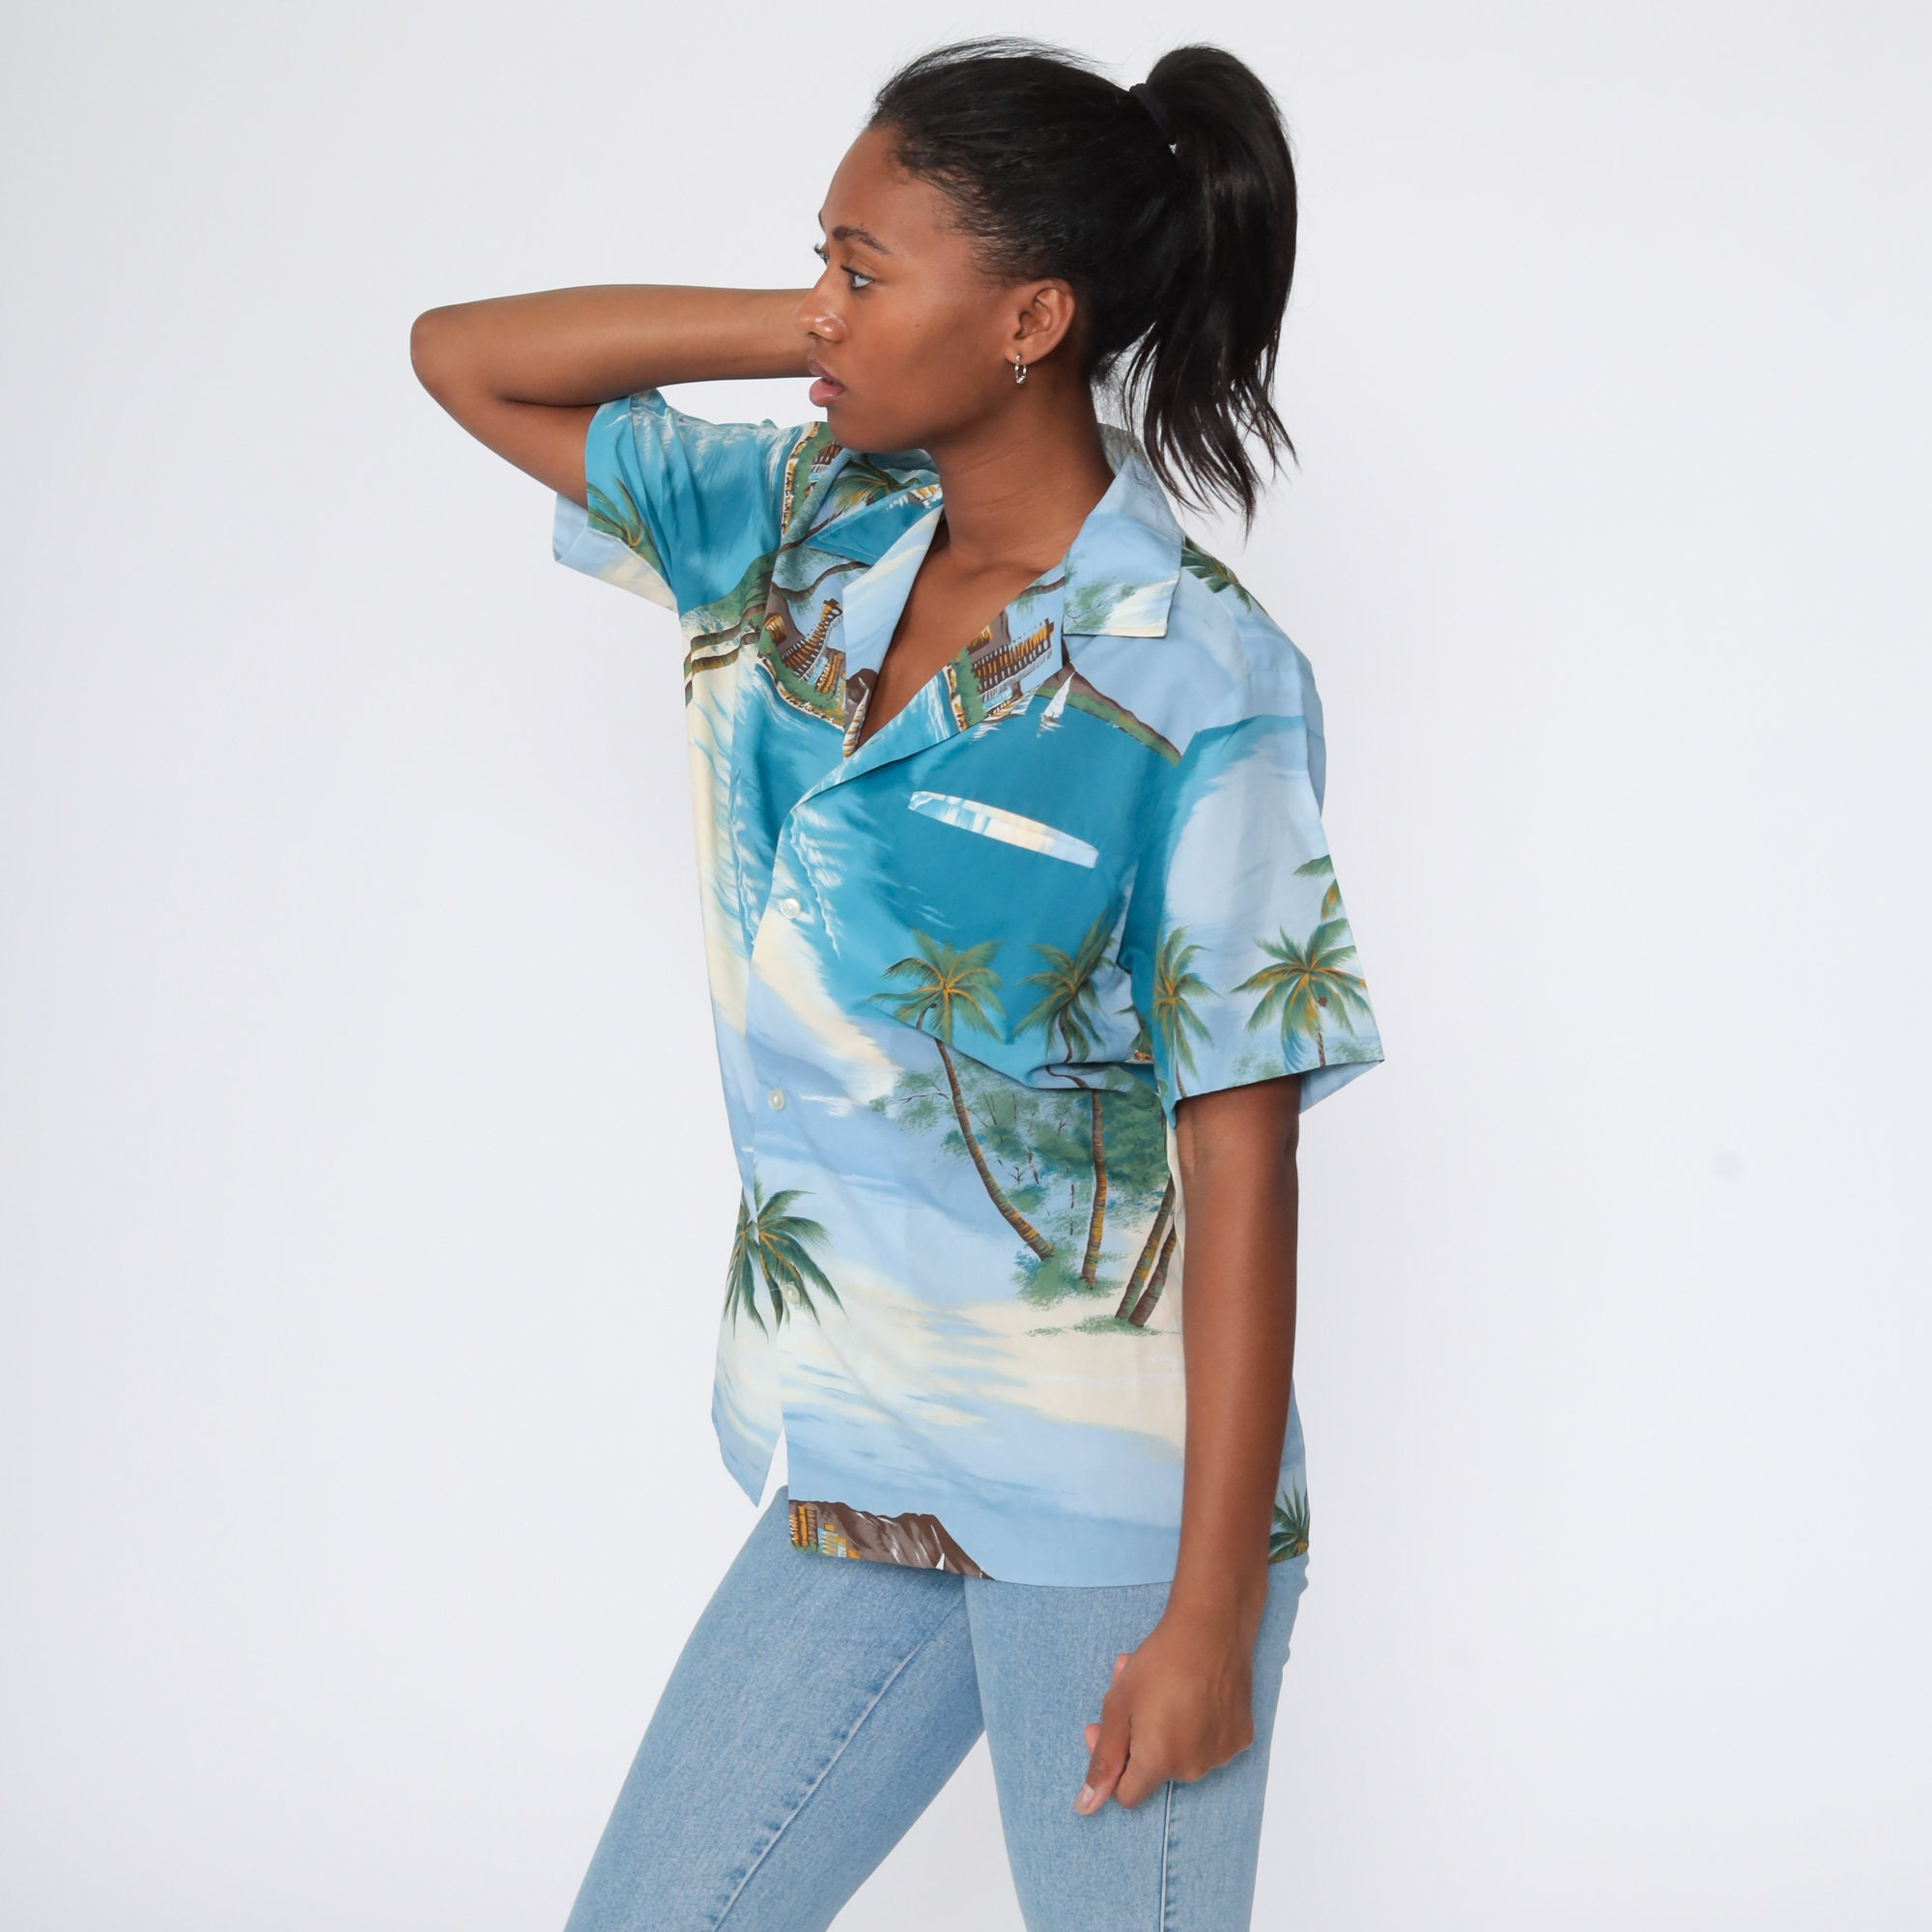 Hawaiian Shirt Tropical Shirt 80s PALM TREE Blouse SURFER Button Up Shirt Sailboat Print Top Beach Yacht Shirt Sea Ocean Blue Medium Large